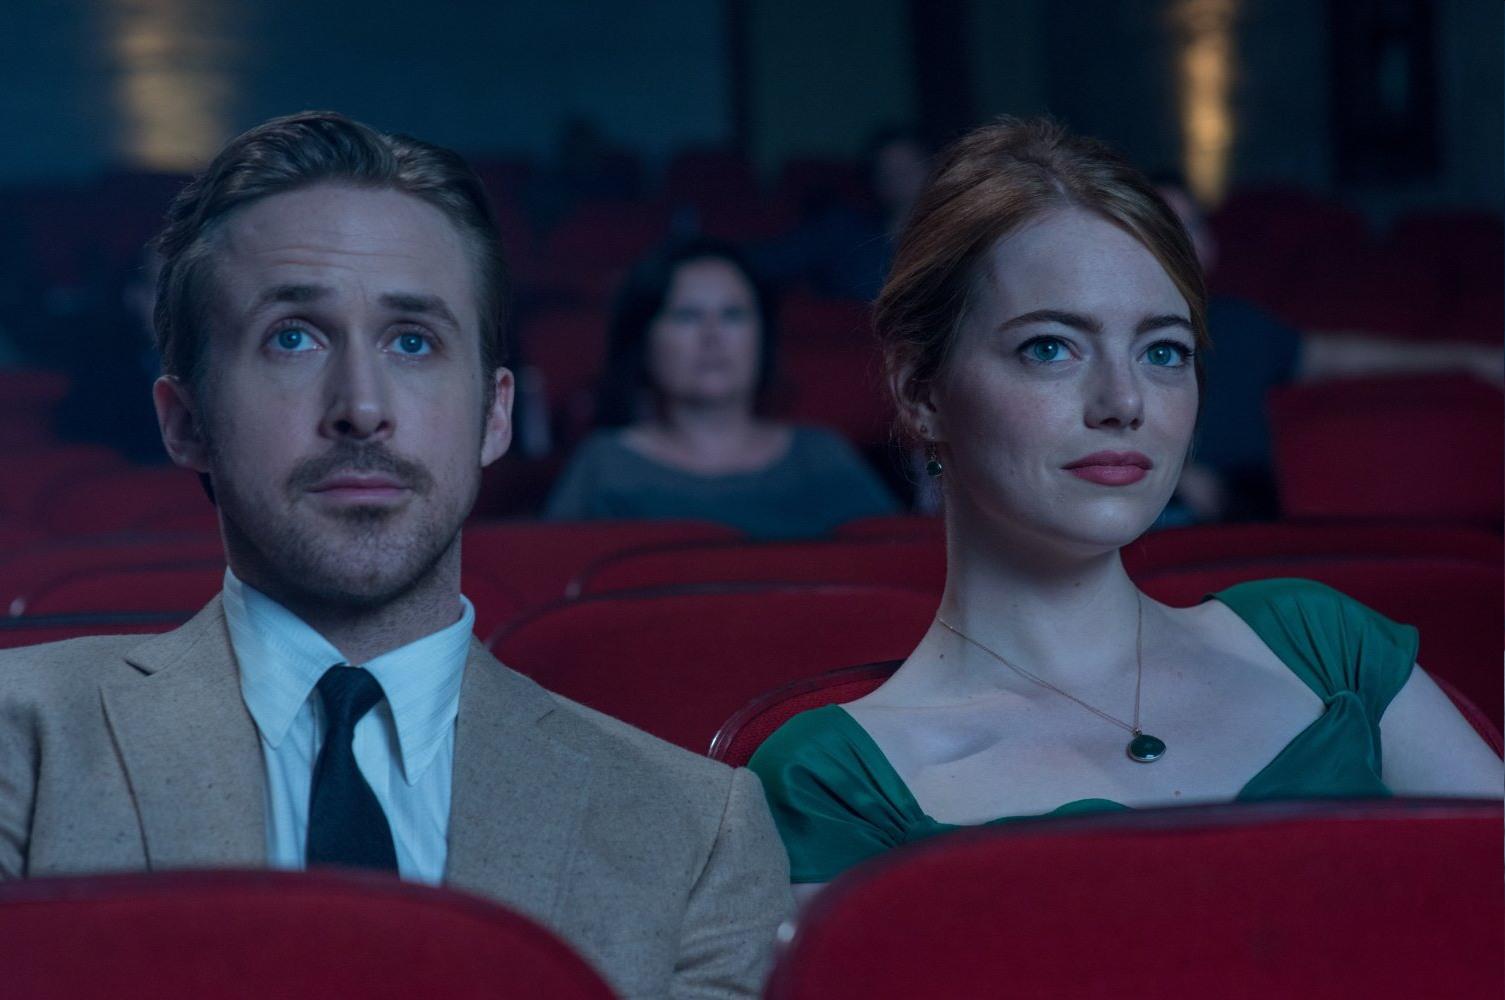 Japan premiere of 'La La Land'  bitchy | Nameless Oscar voter shall be 'embarrassed' when 'La La Land' wins la1